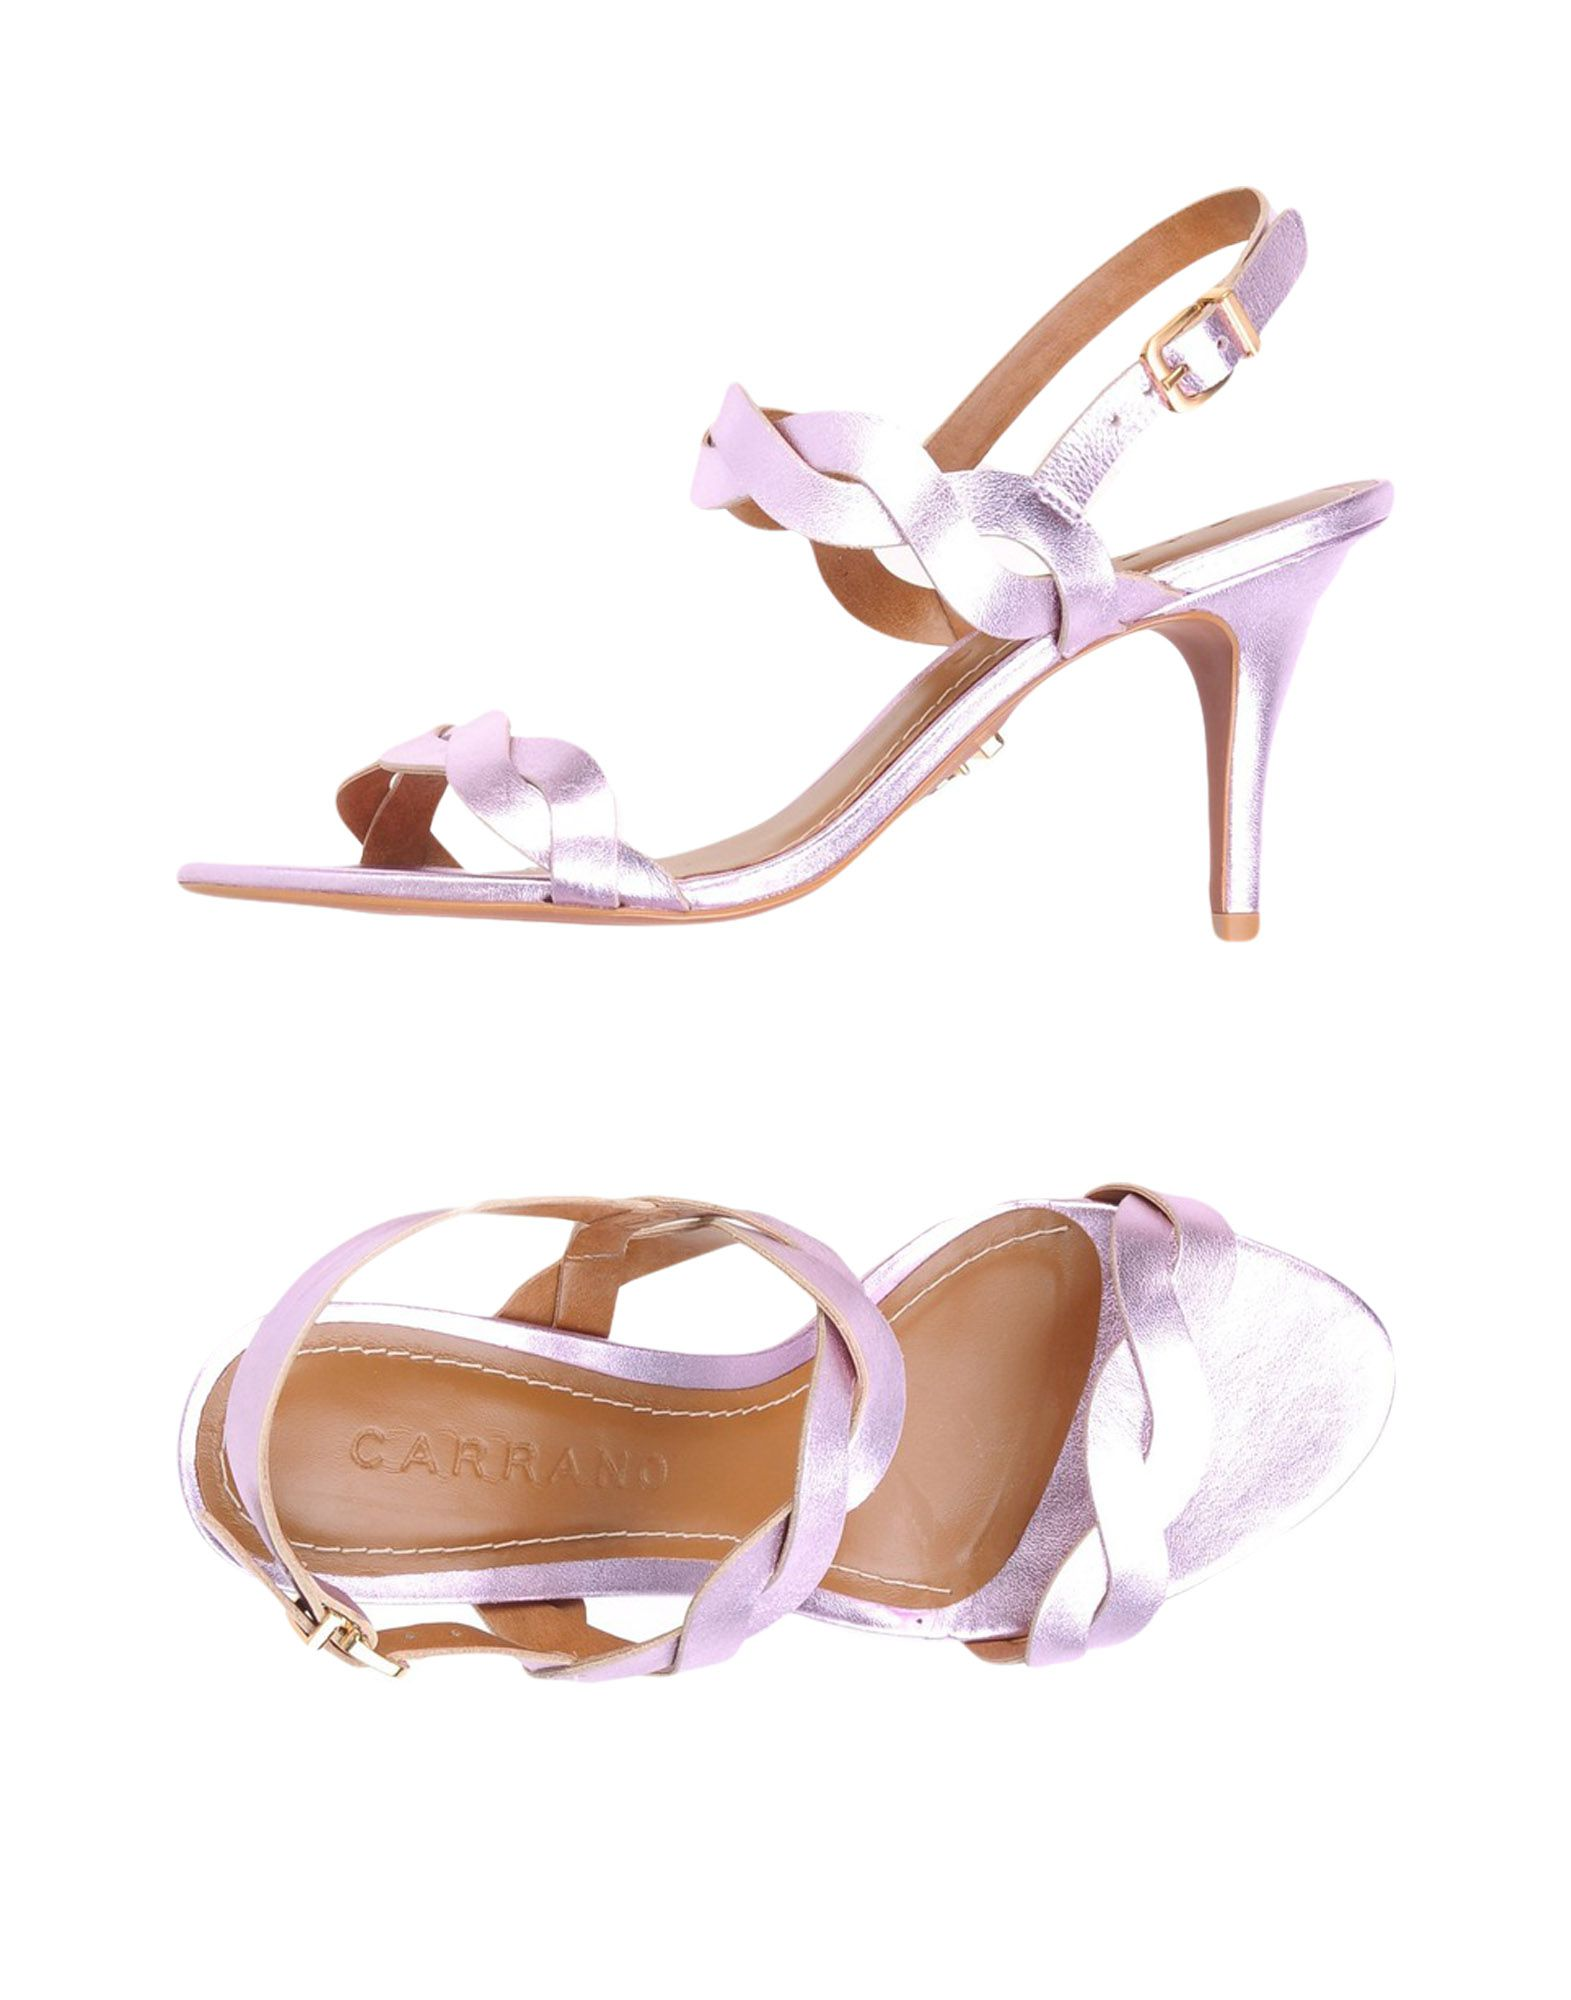 Sandali Carrano Sandals - Donna - 11456578JS